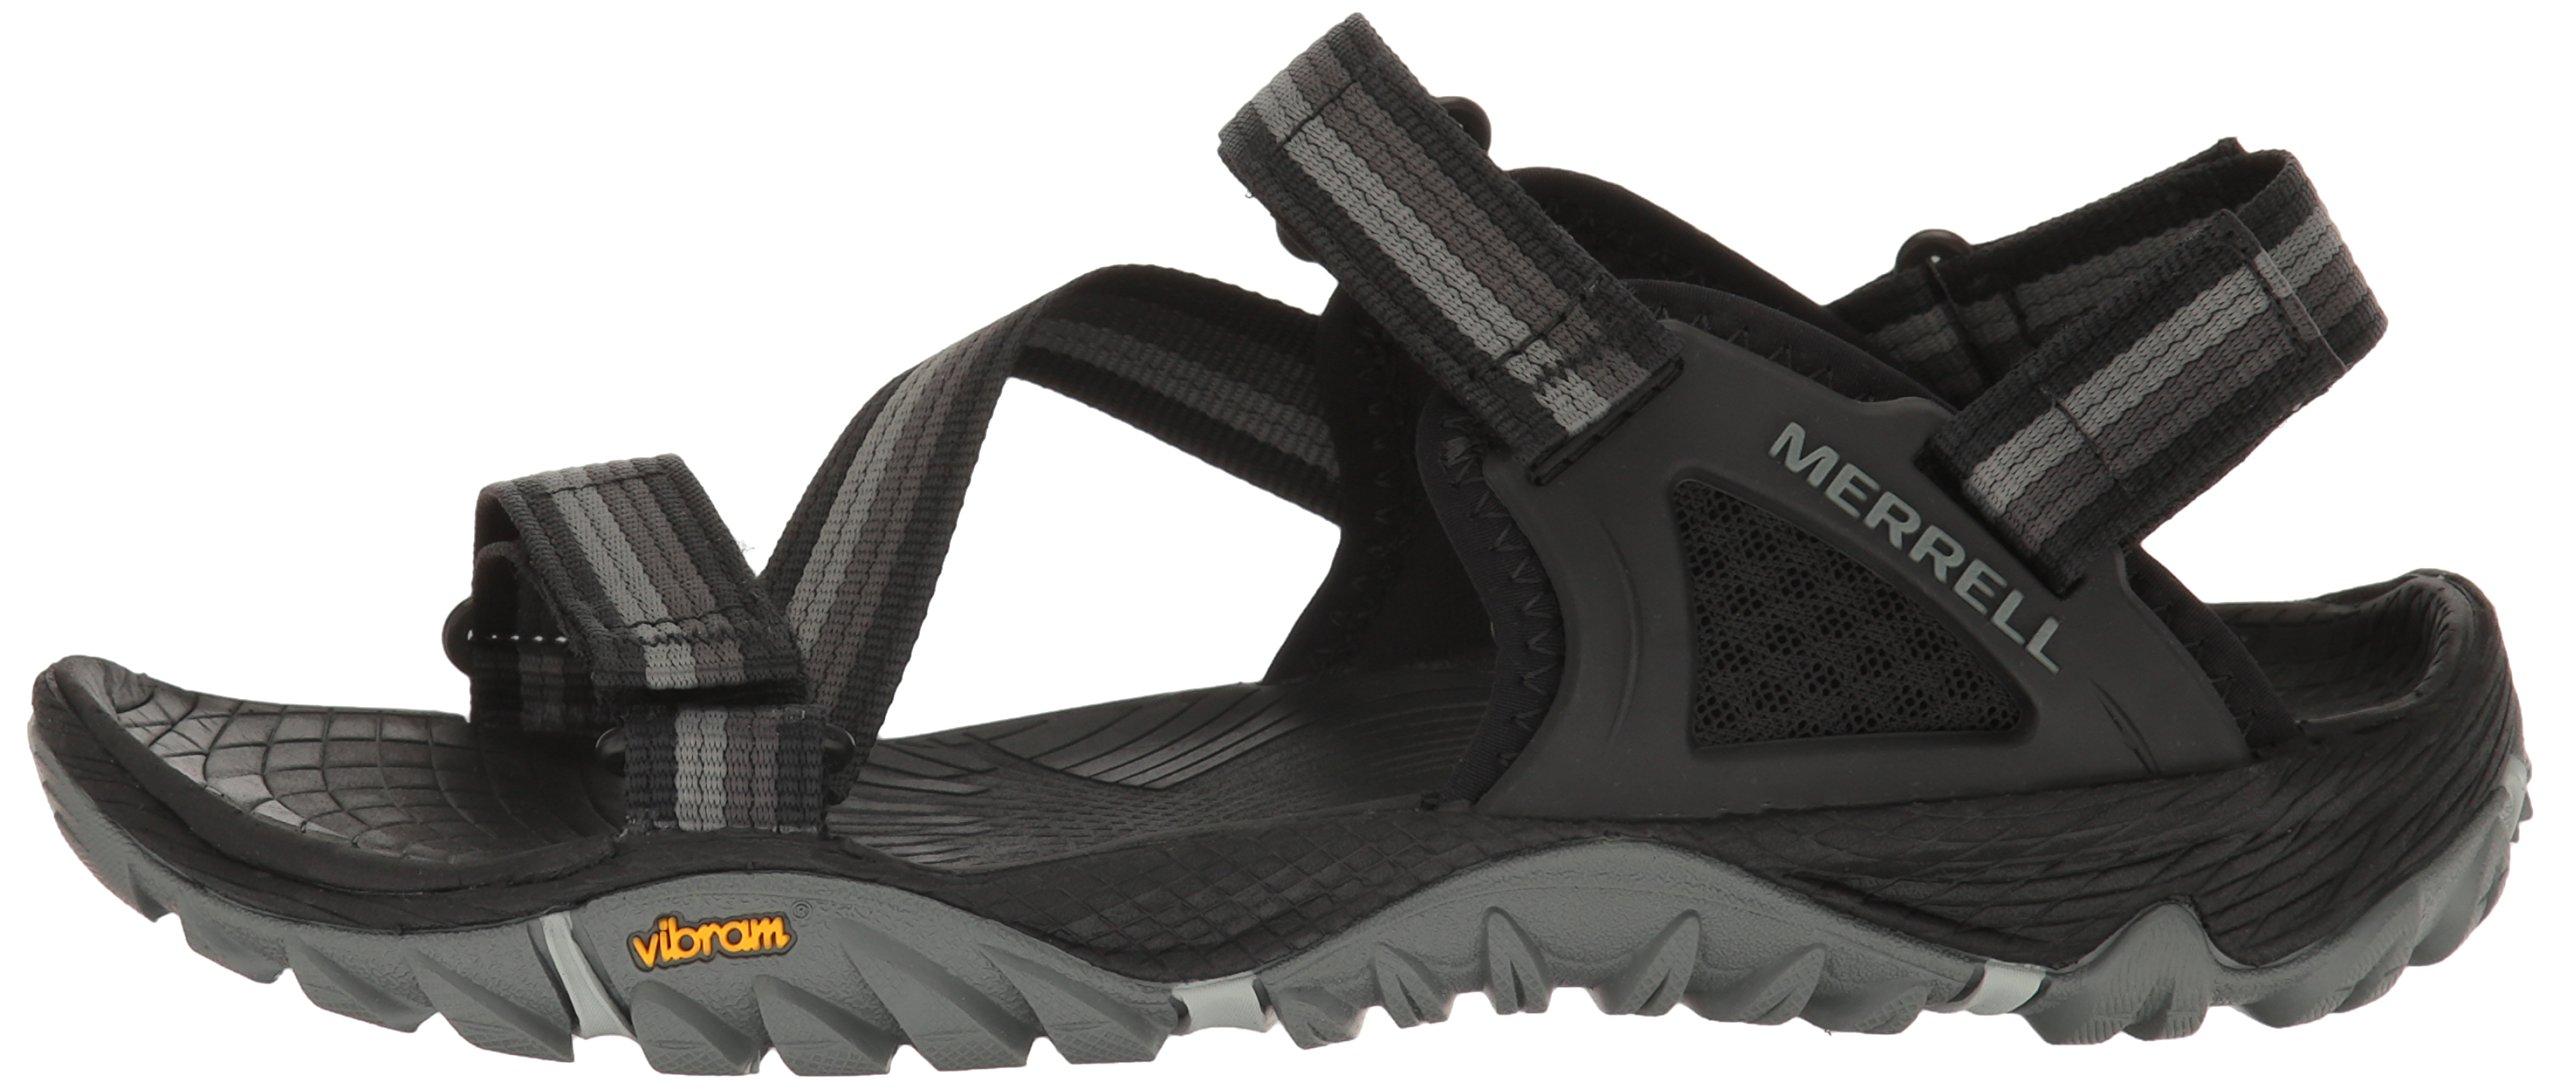 Merrell Women's All Out Blaze Web Sandal, Black, 9 M US by Merrell (Image #5)